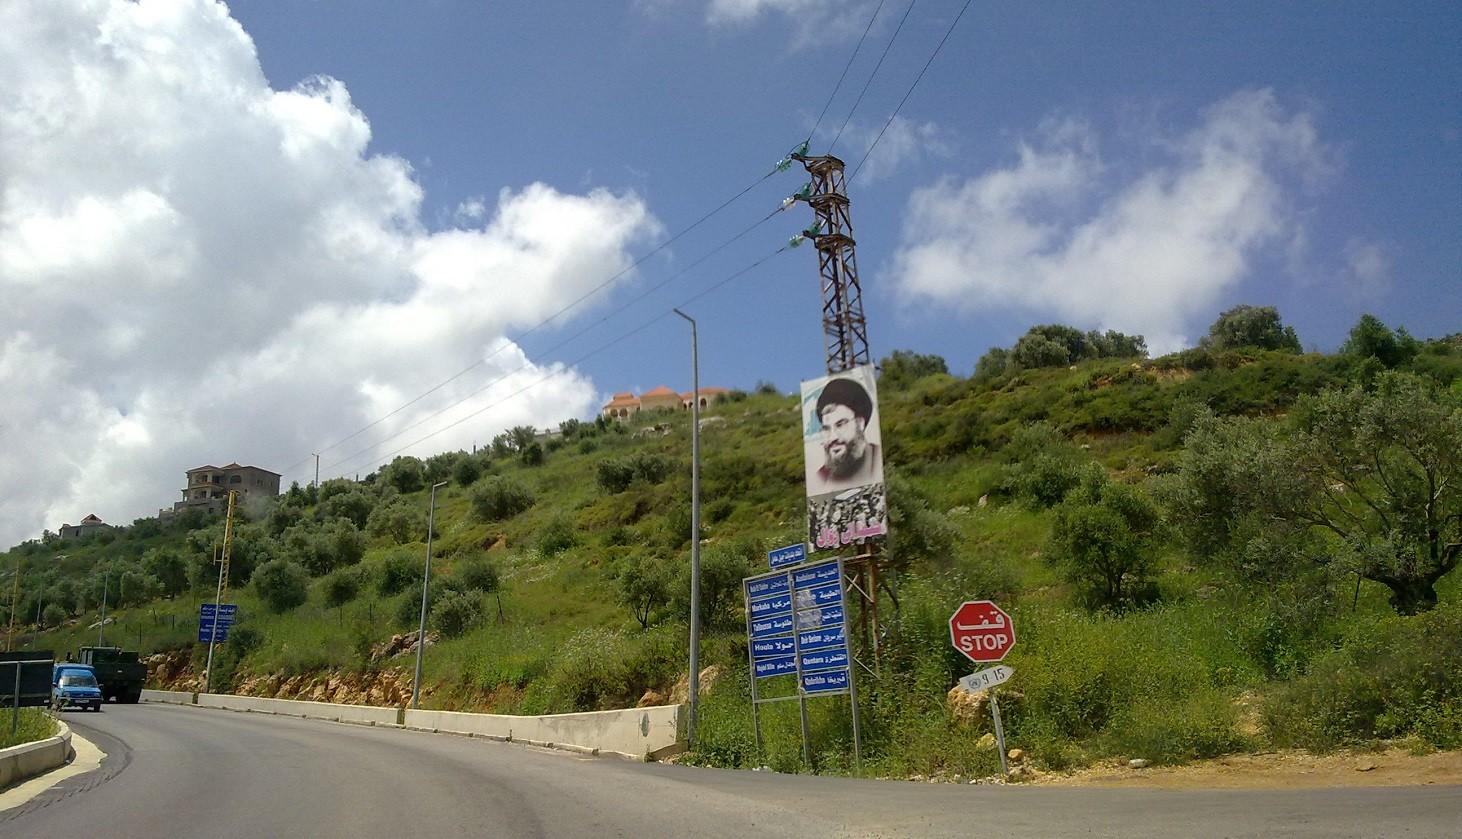 kafr_kila_lebanon_-_panoramio_7